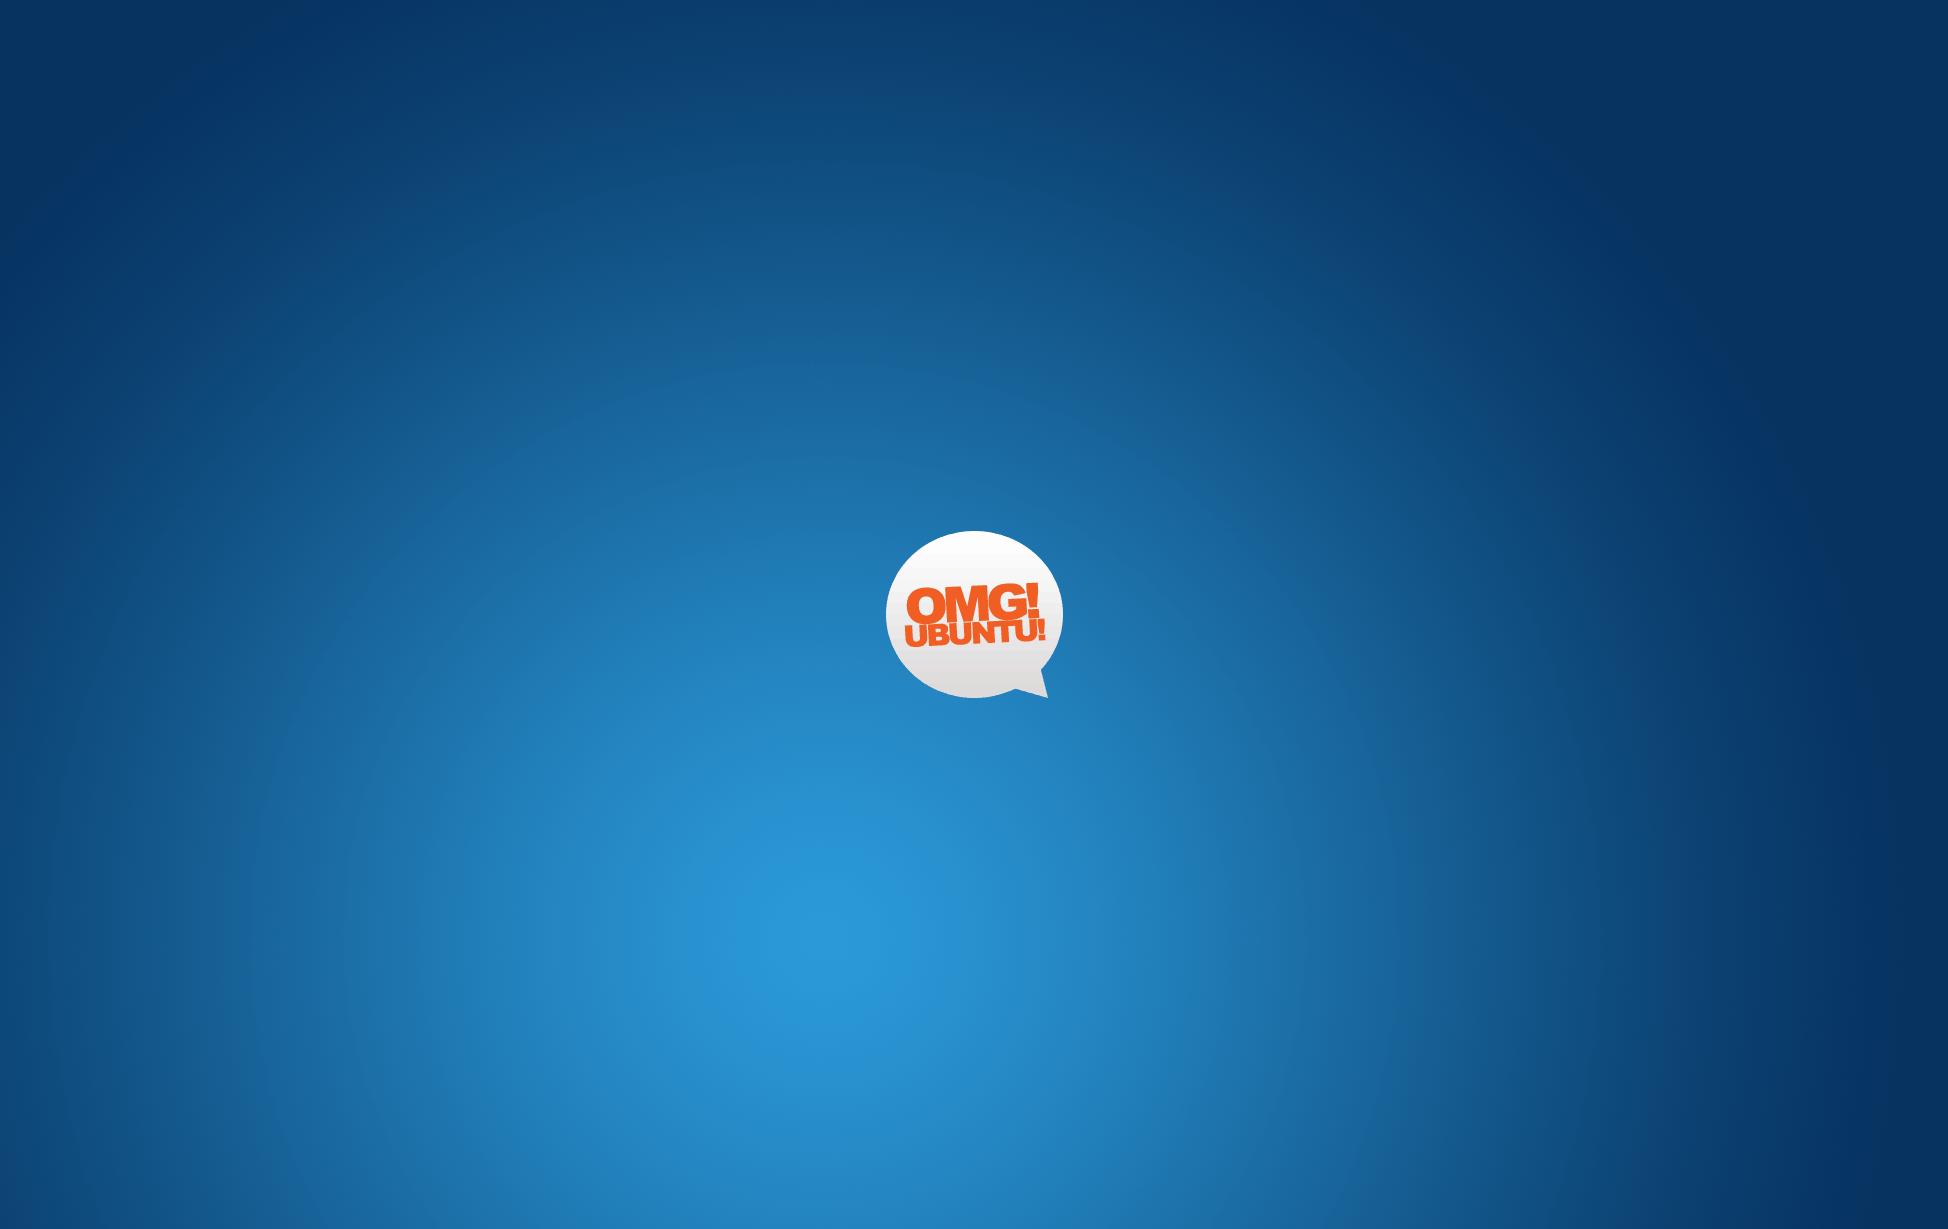 OMG Ubuntu Wallpaper Blue by d0od on DeviantArt